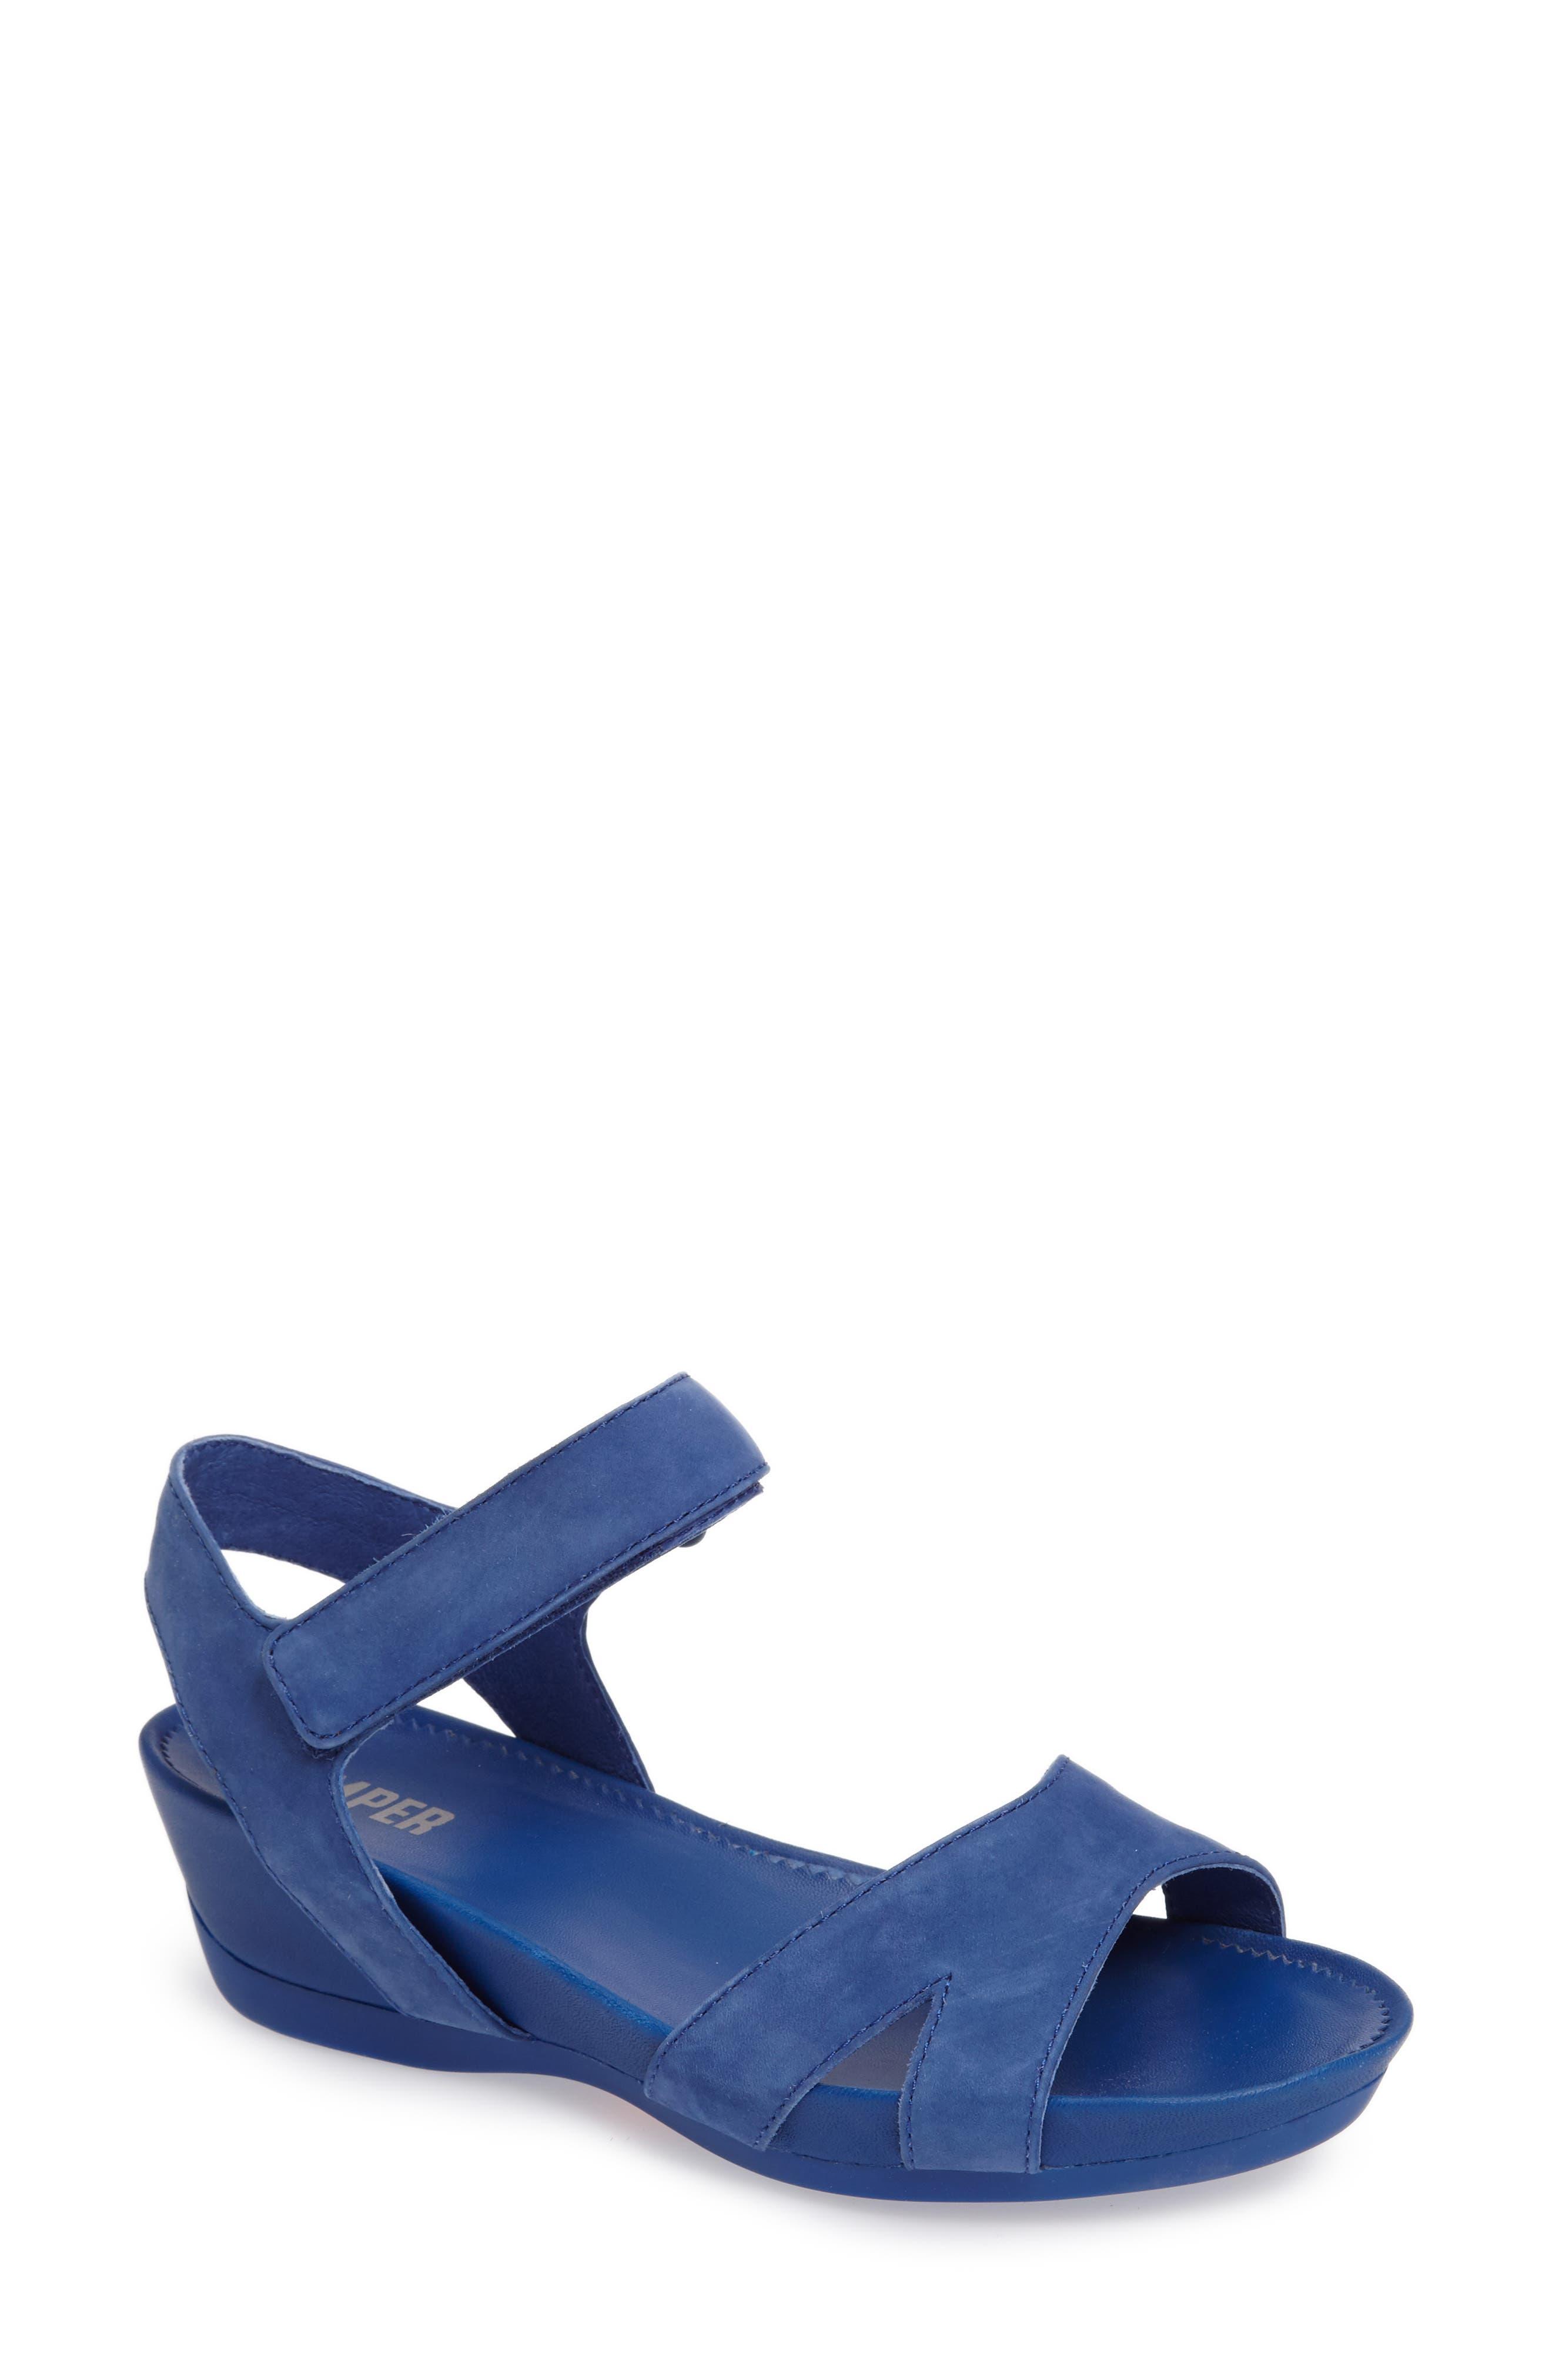 'Micro' Sandal,                             Main thumbnail 1, color,                             Blue Leather